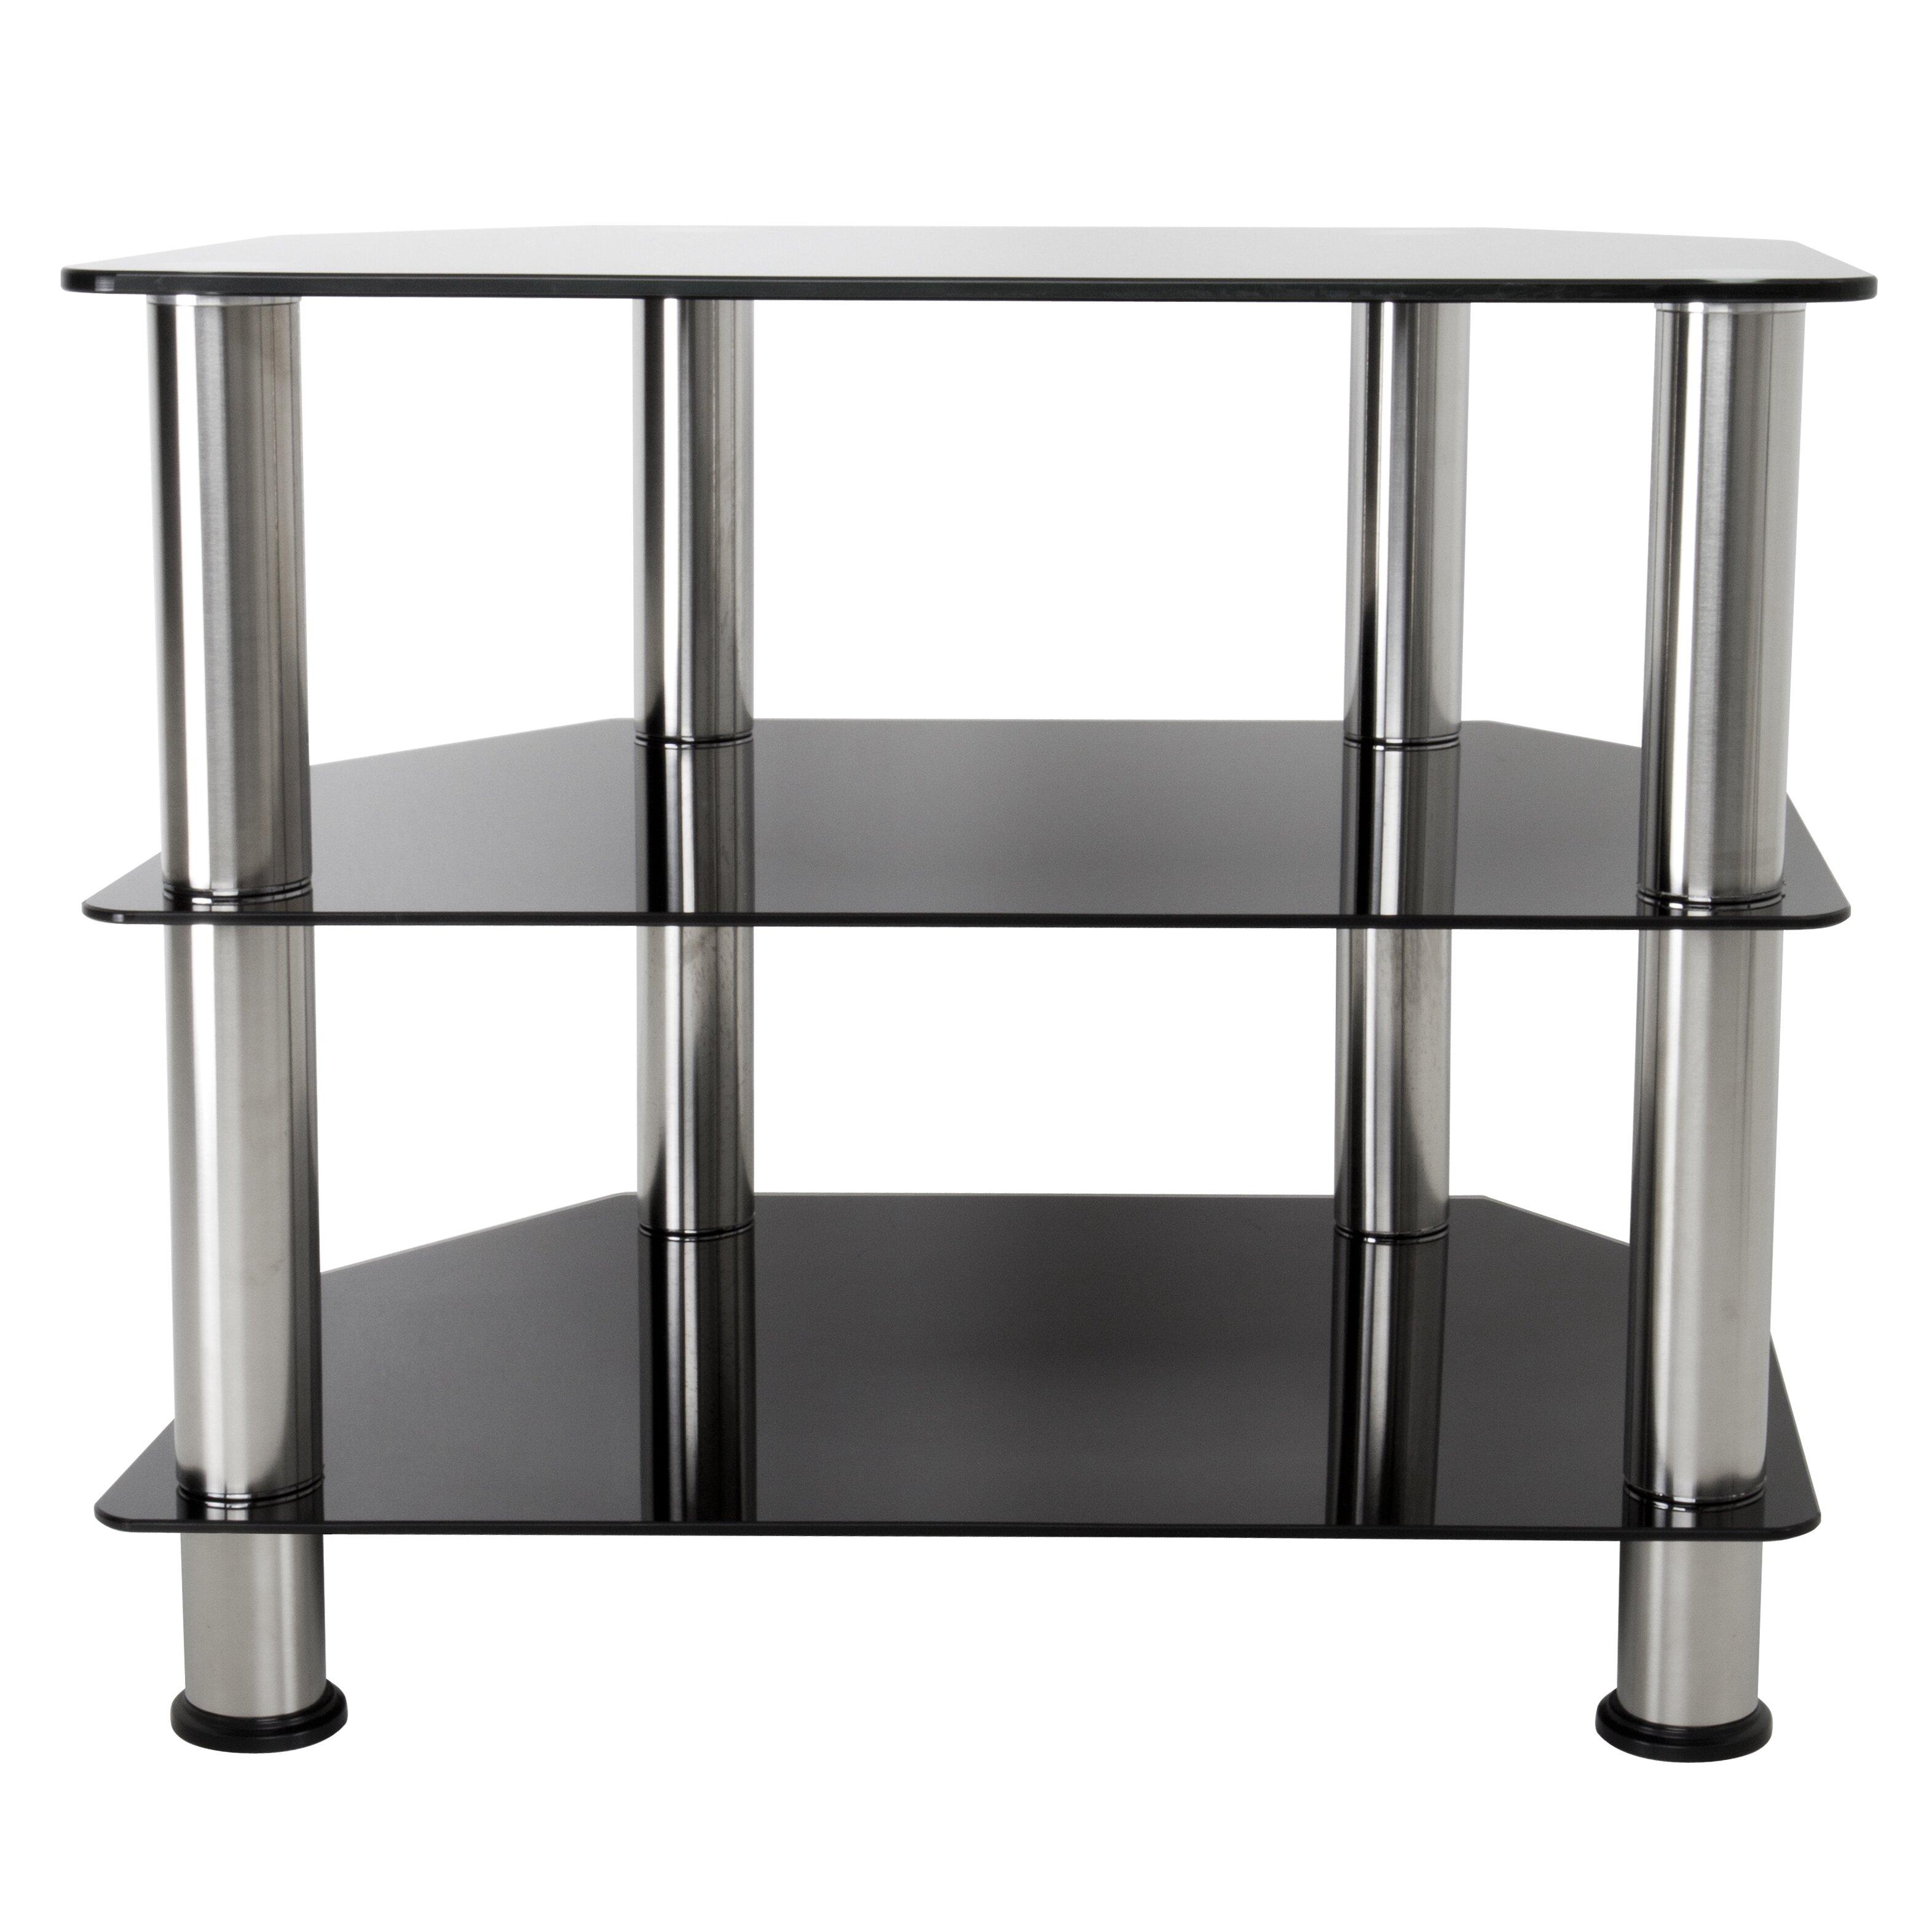 Avf tv stand reviews wayfair supply for Avf furniture